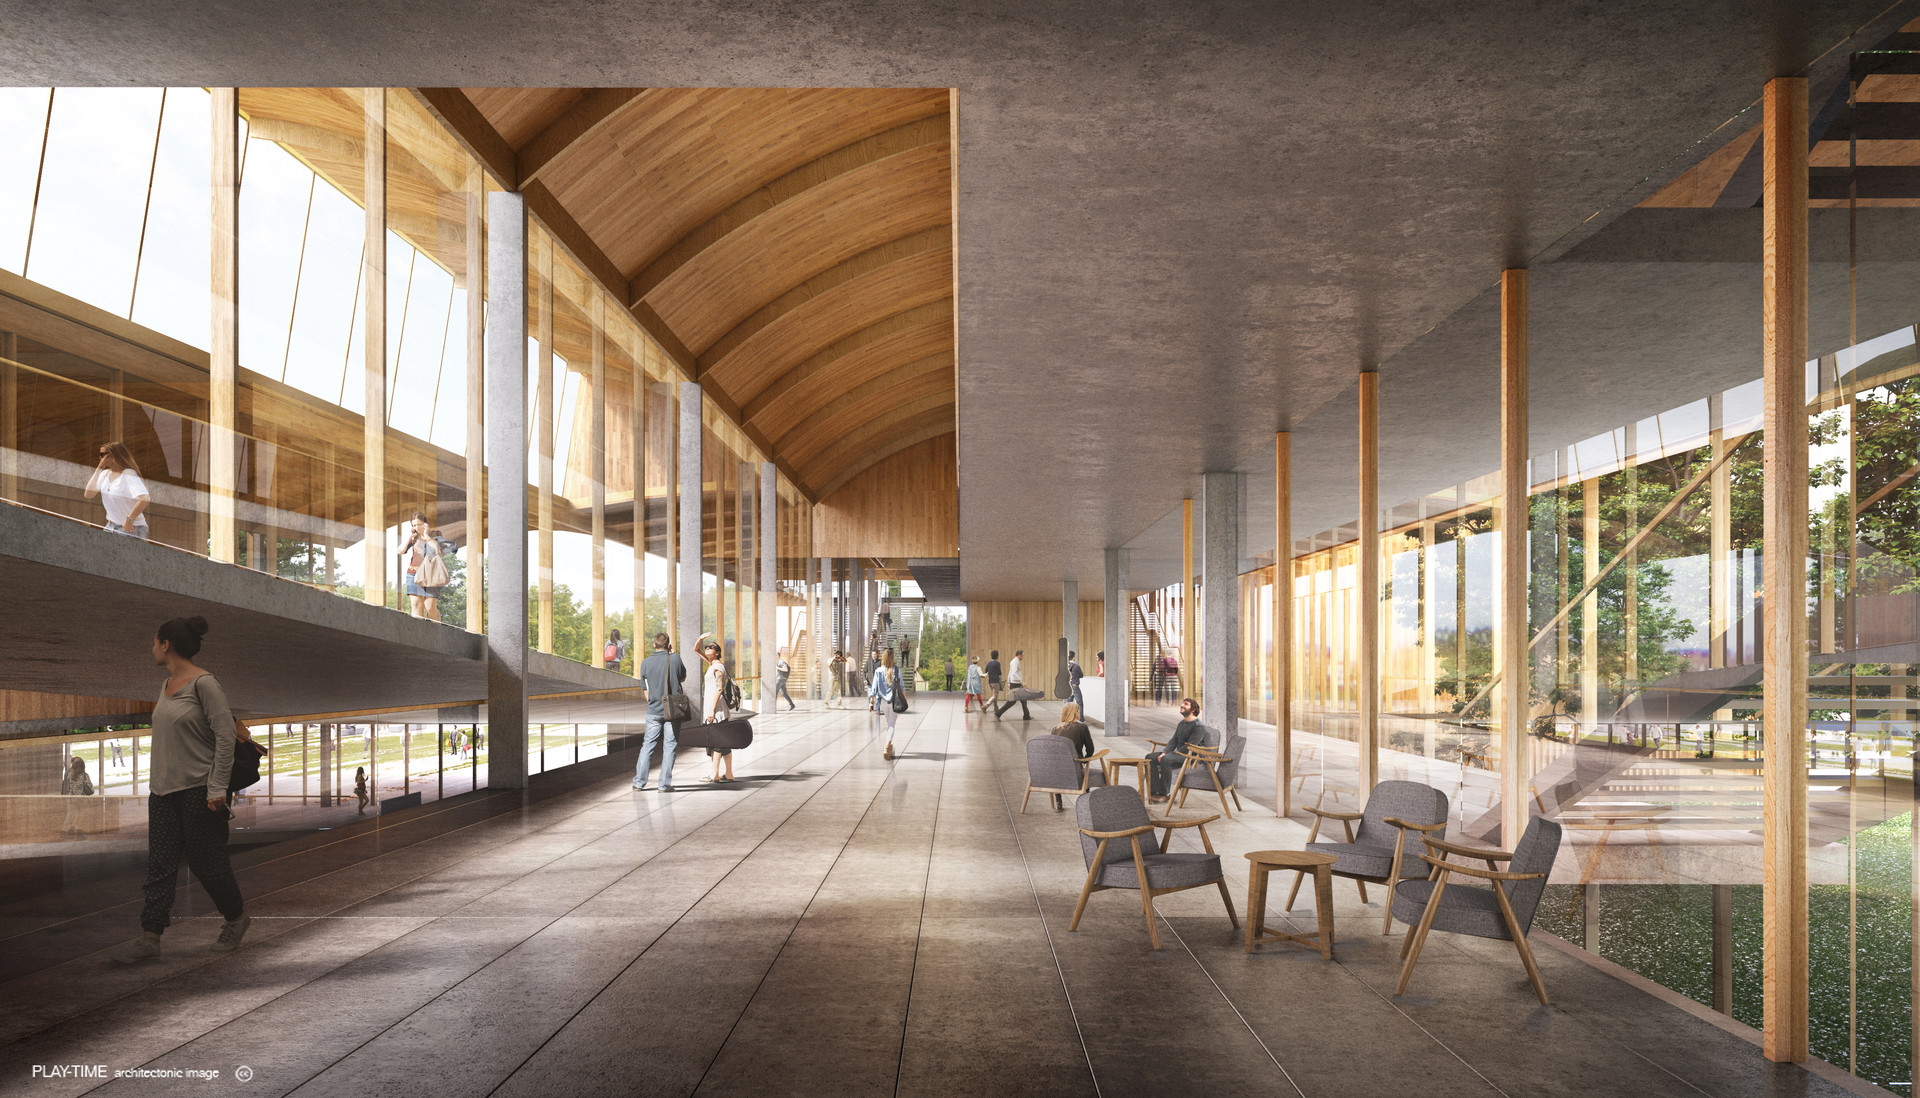 Play time architectonic image eovastudio conservatory in crackovia 01